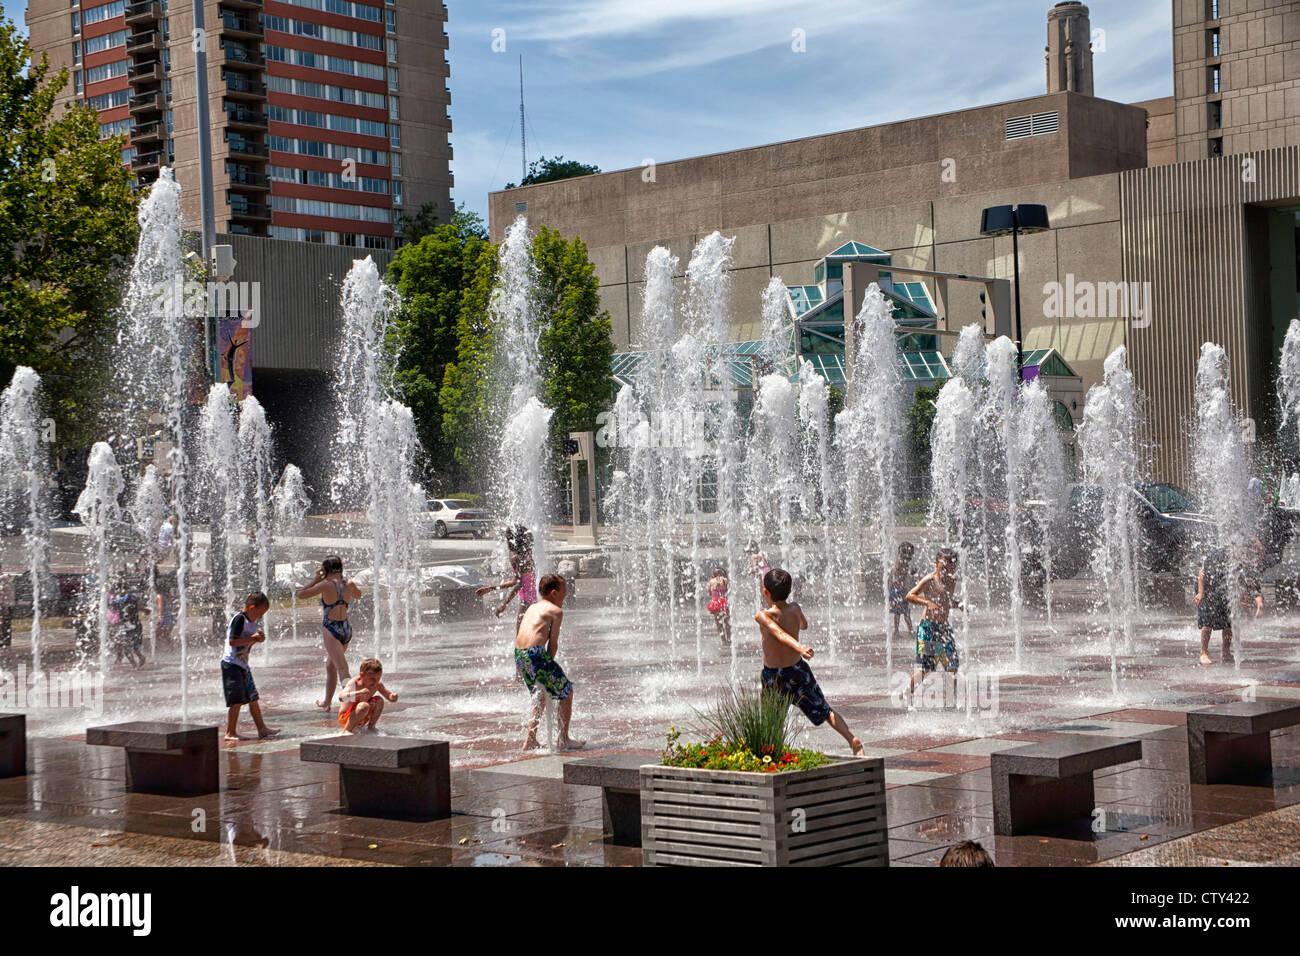 Crown Center in Kansas City, MO - Stock Image